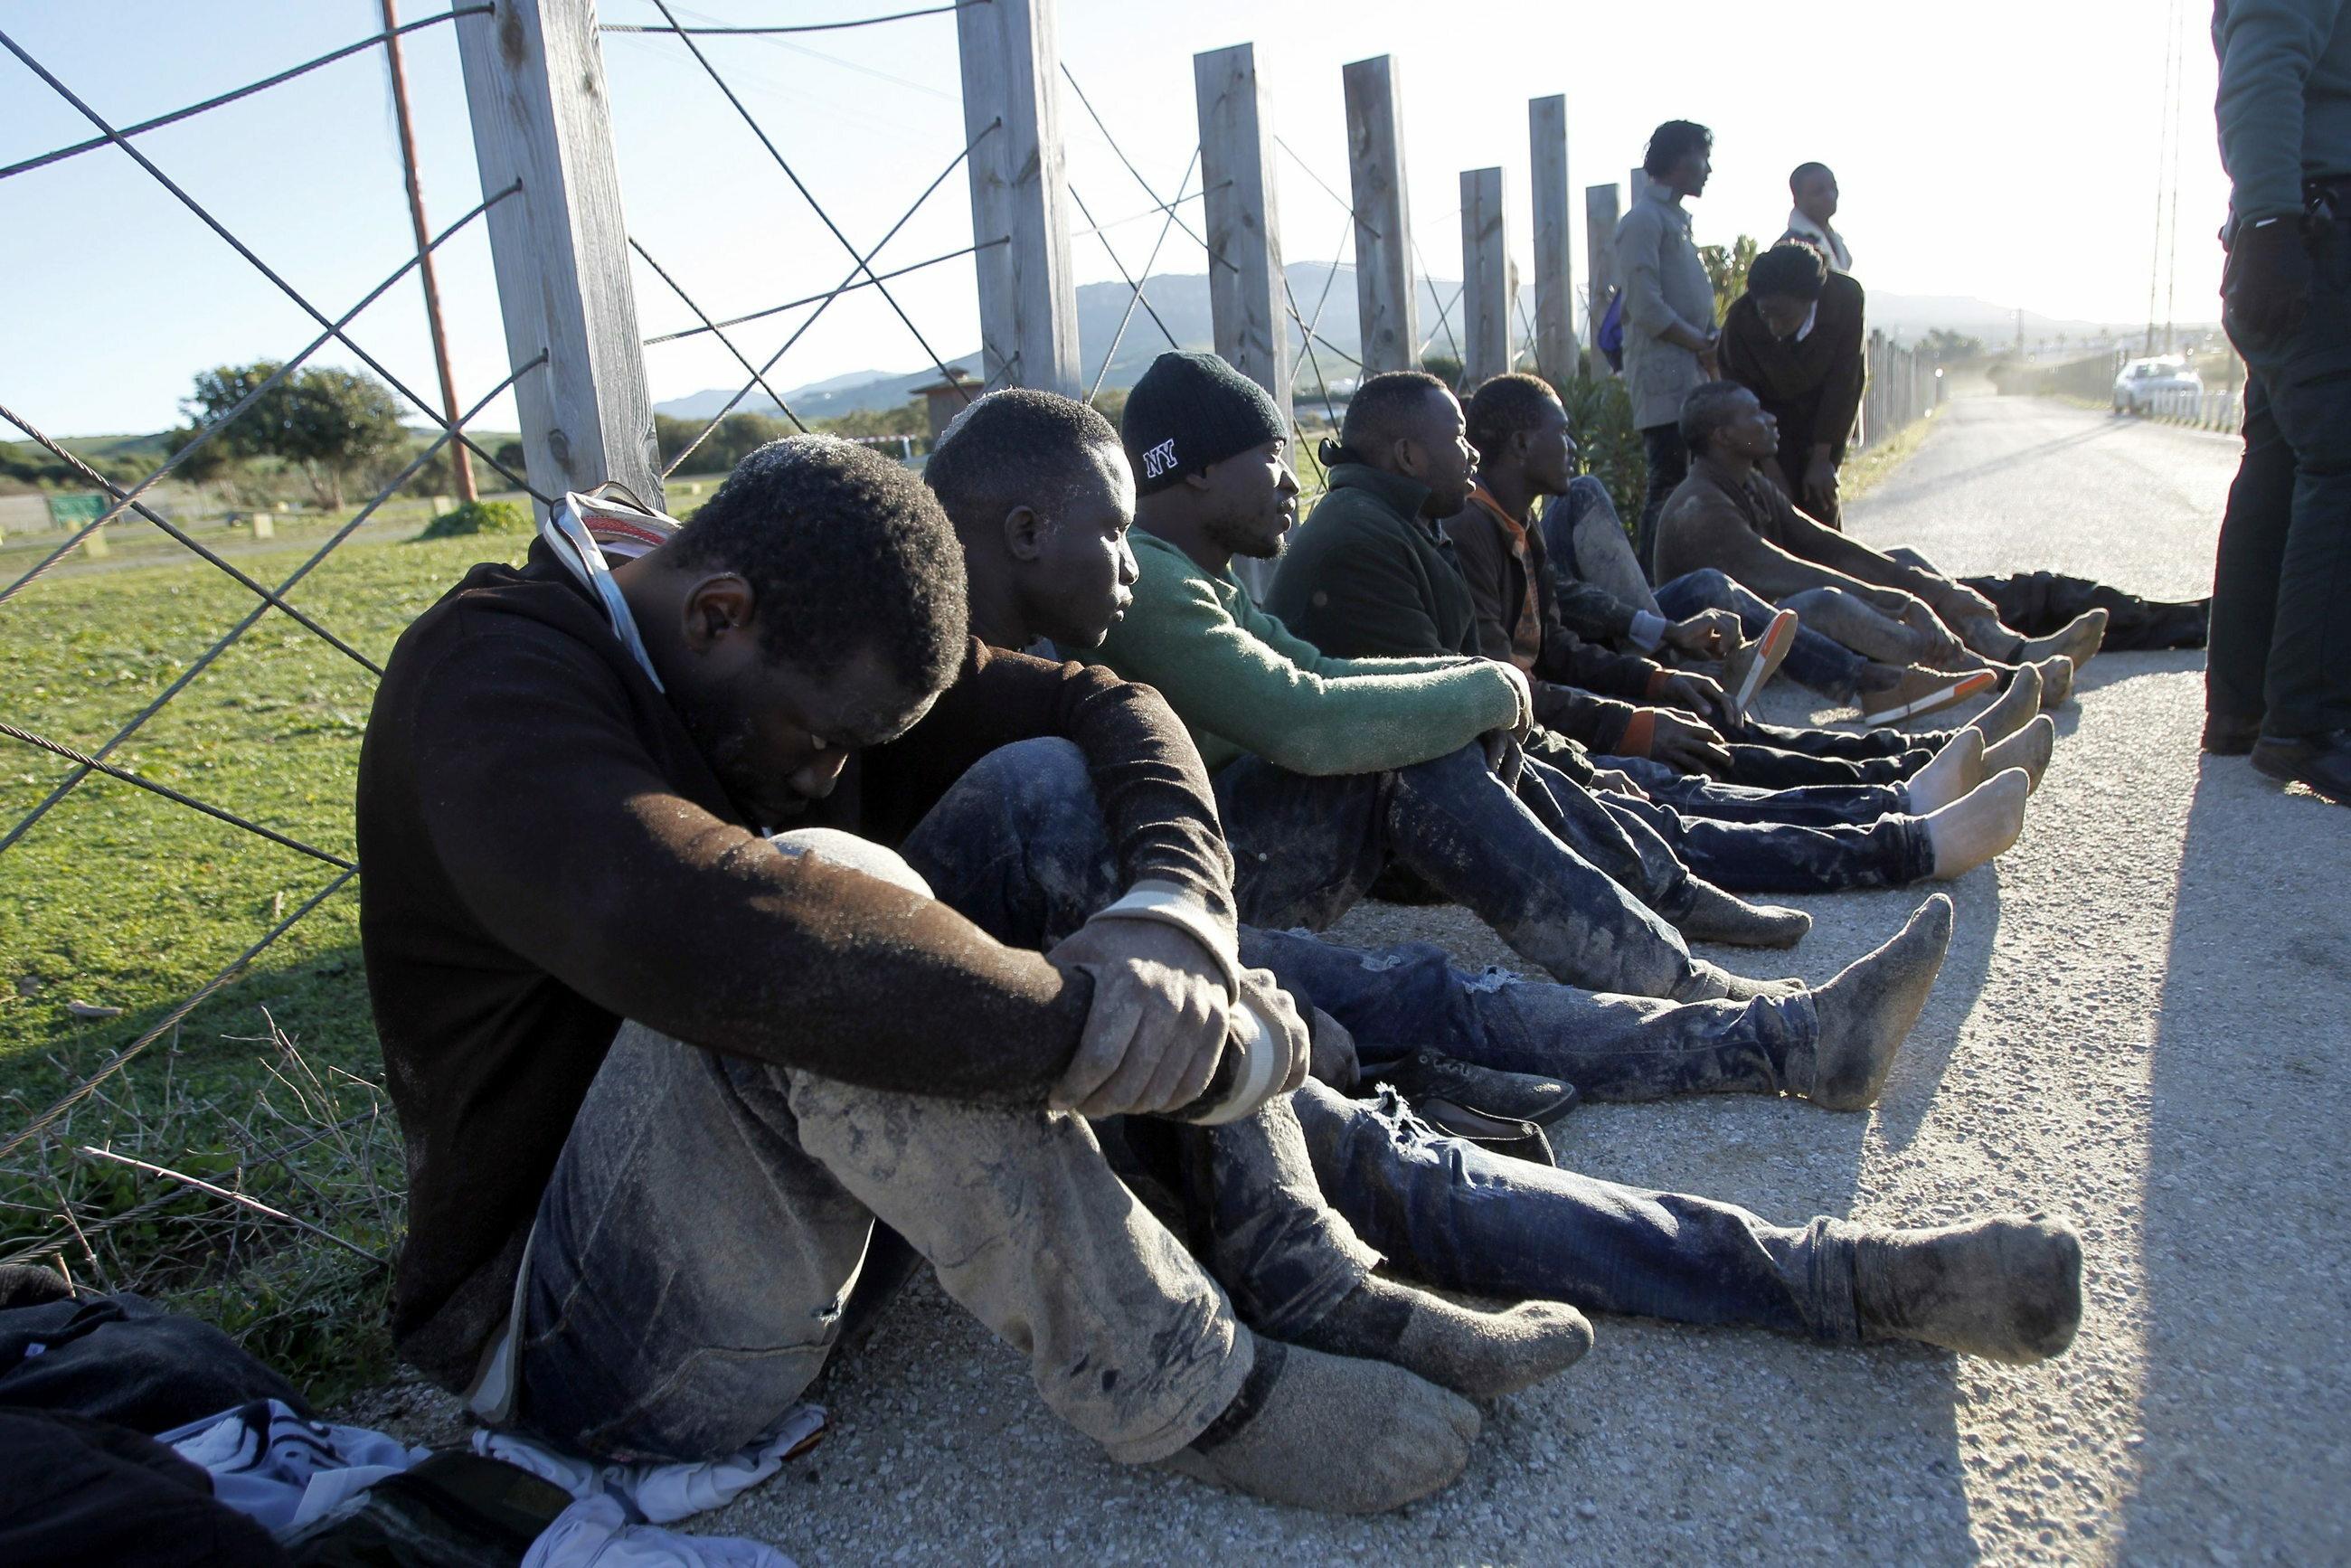 zdj. ilustracyjne, uchodźcy